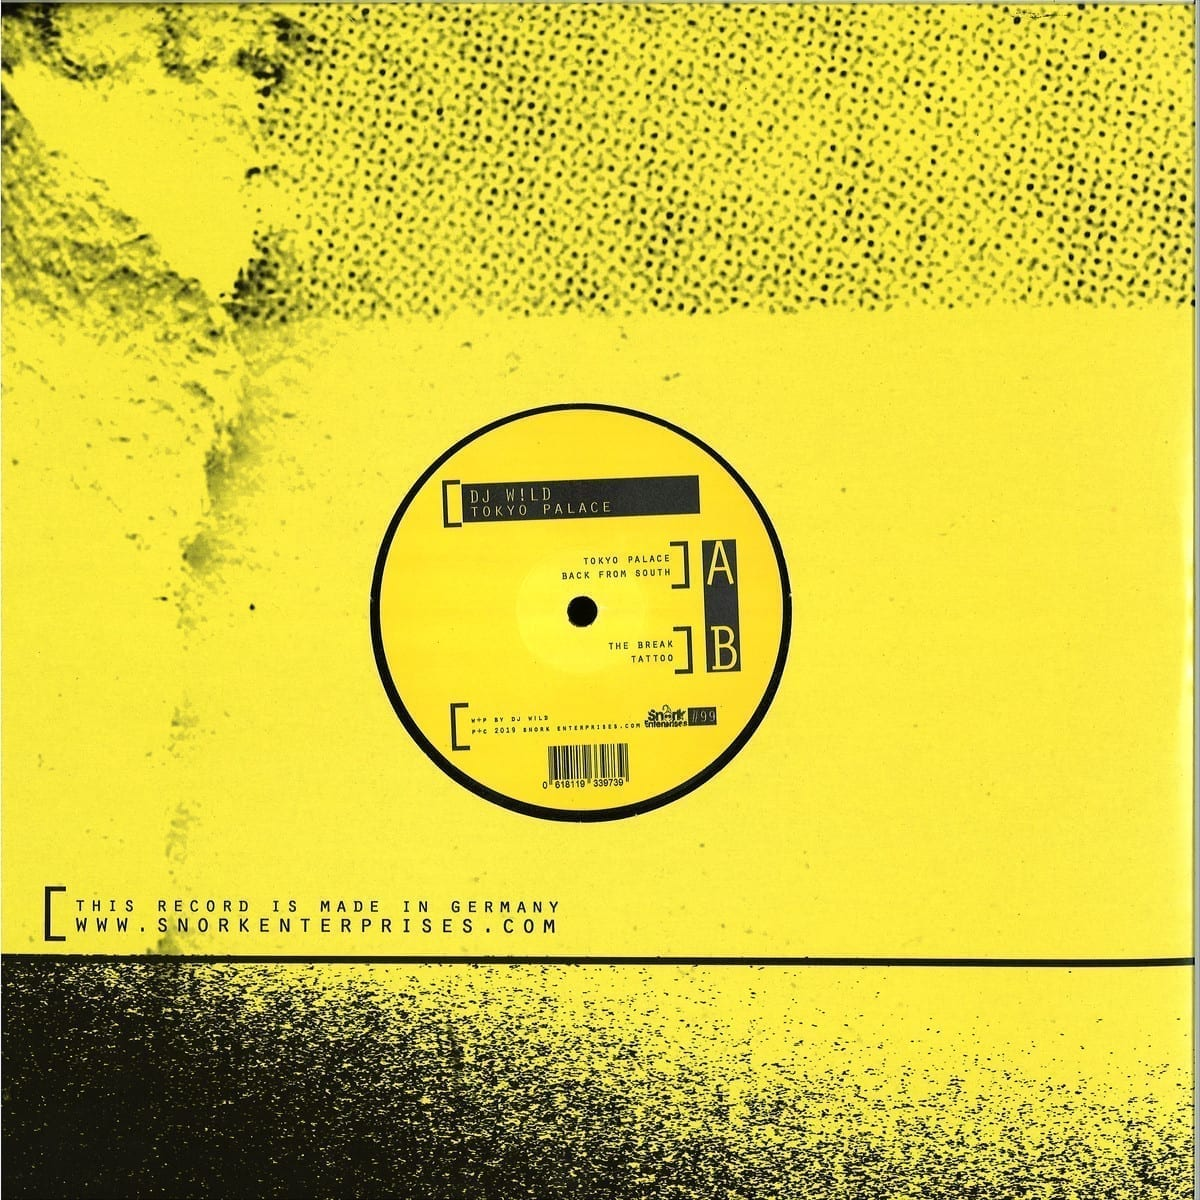 DJ WILD - Tokyo Palace [Snork Enterprises] back